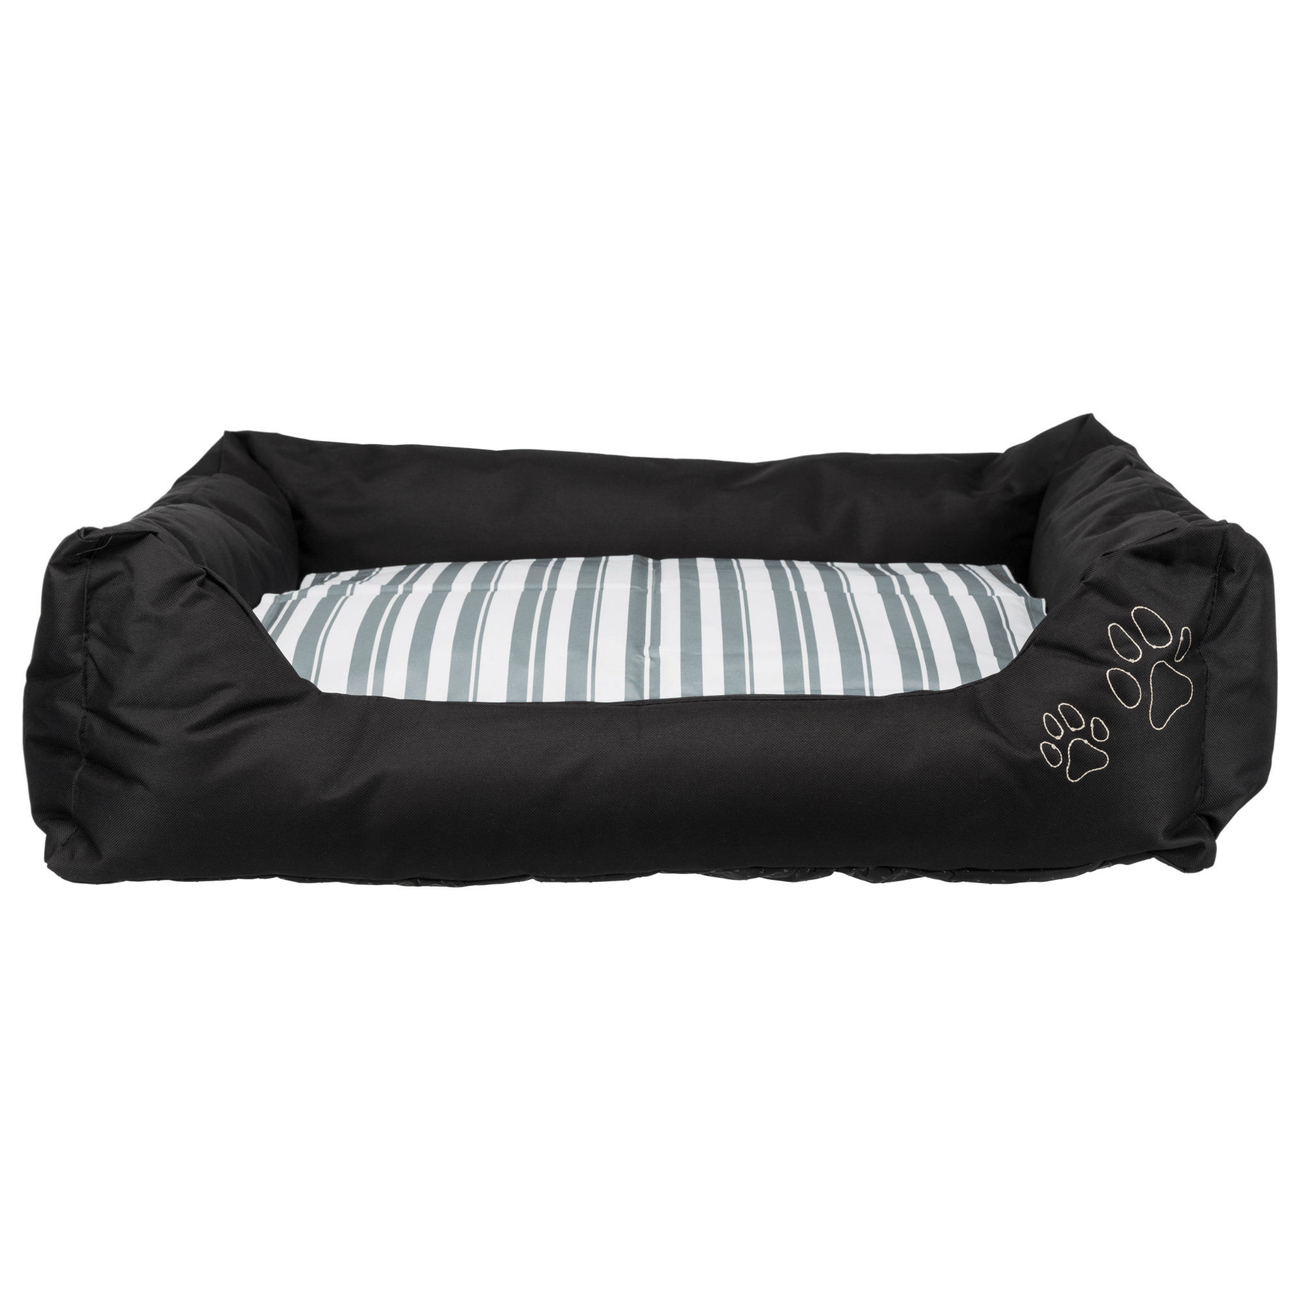 TRIXIE Hunde Kühlmatte Stripes 28773, Bild 4